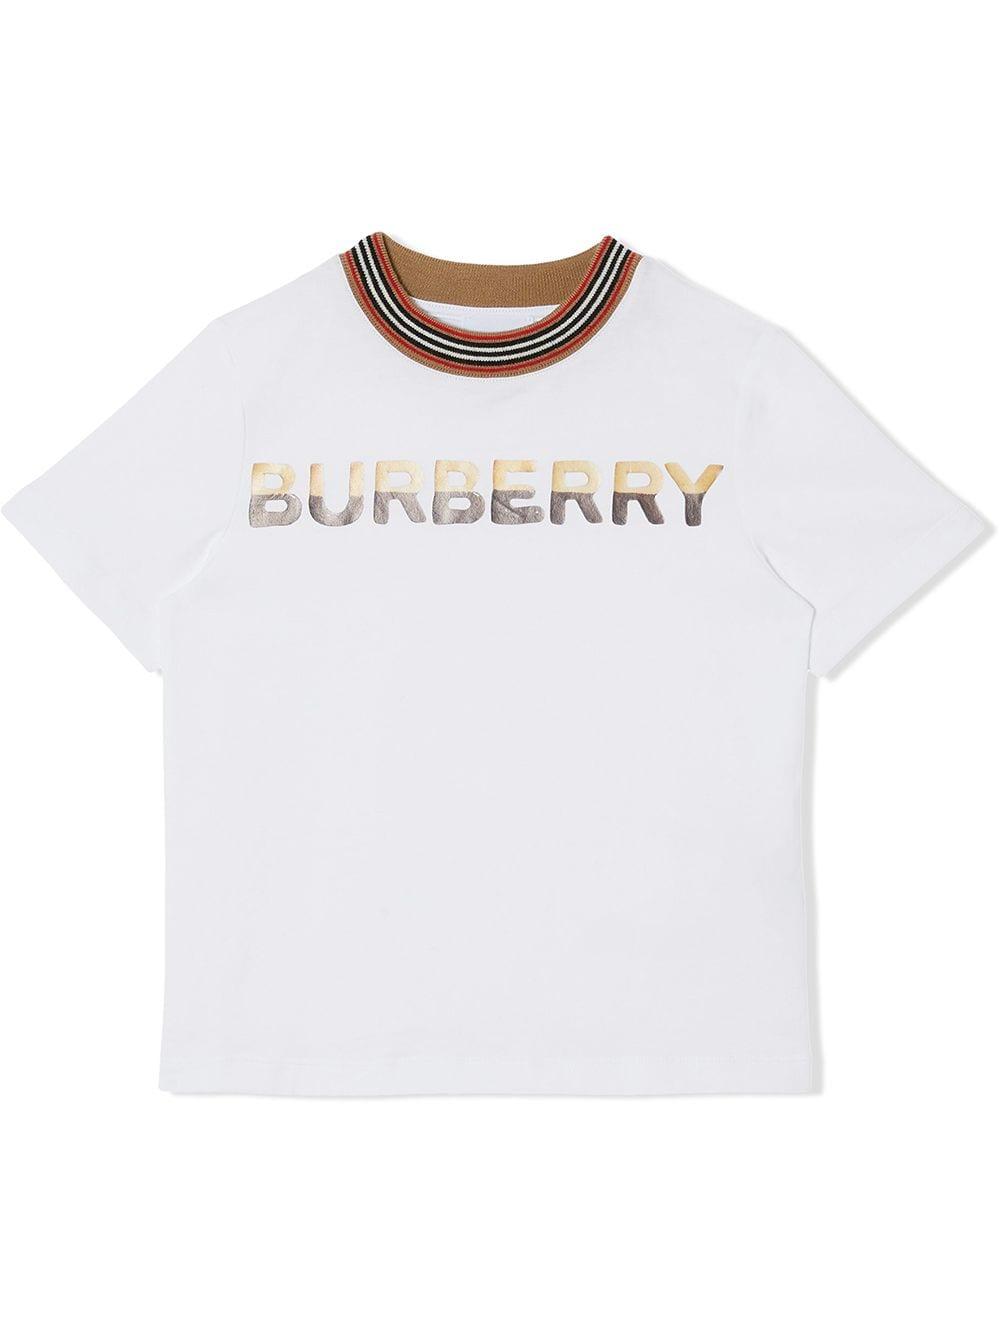 BURBERRY KIDS      8036937A1464#